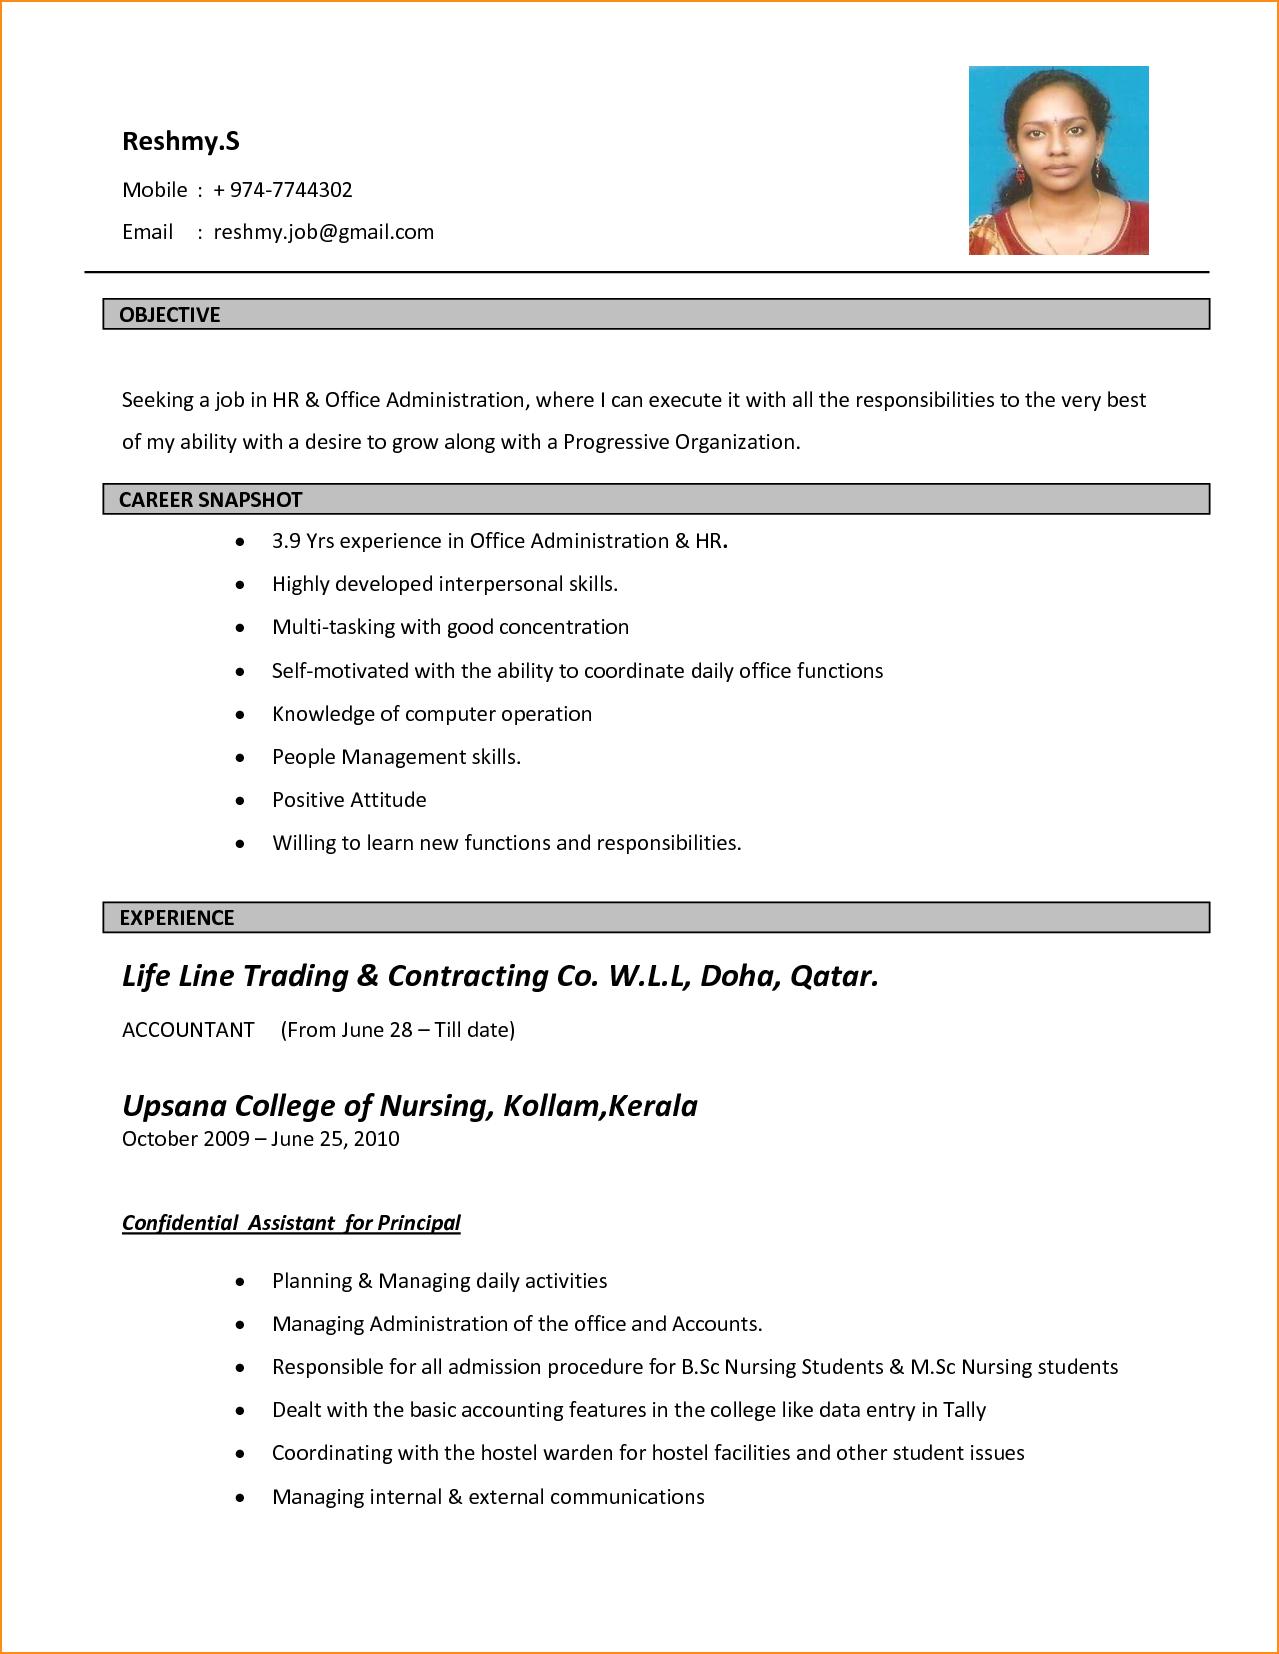 Resume Format Kerala Bio data for marriage, Job letter